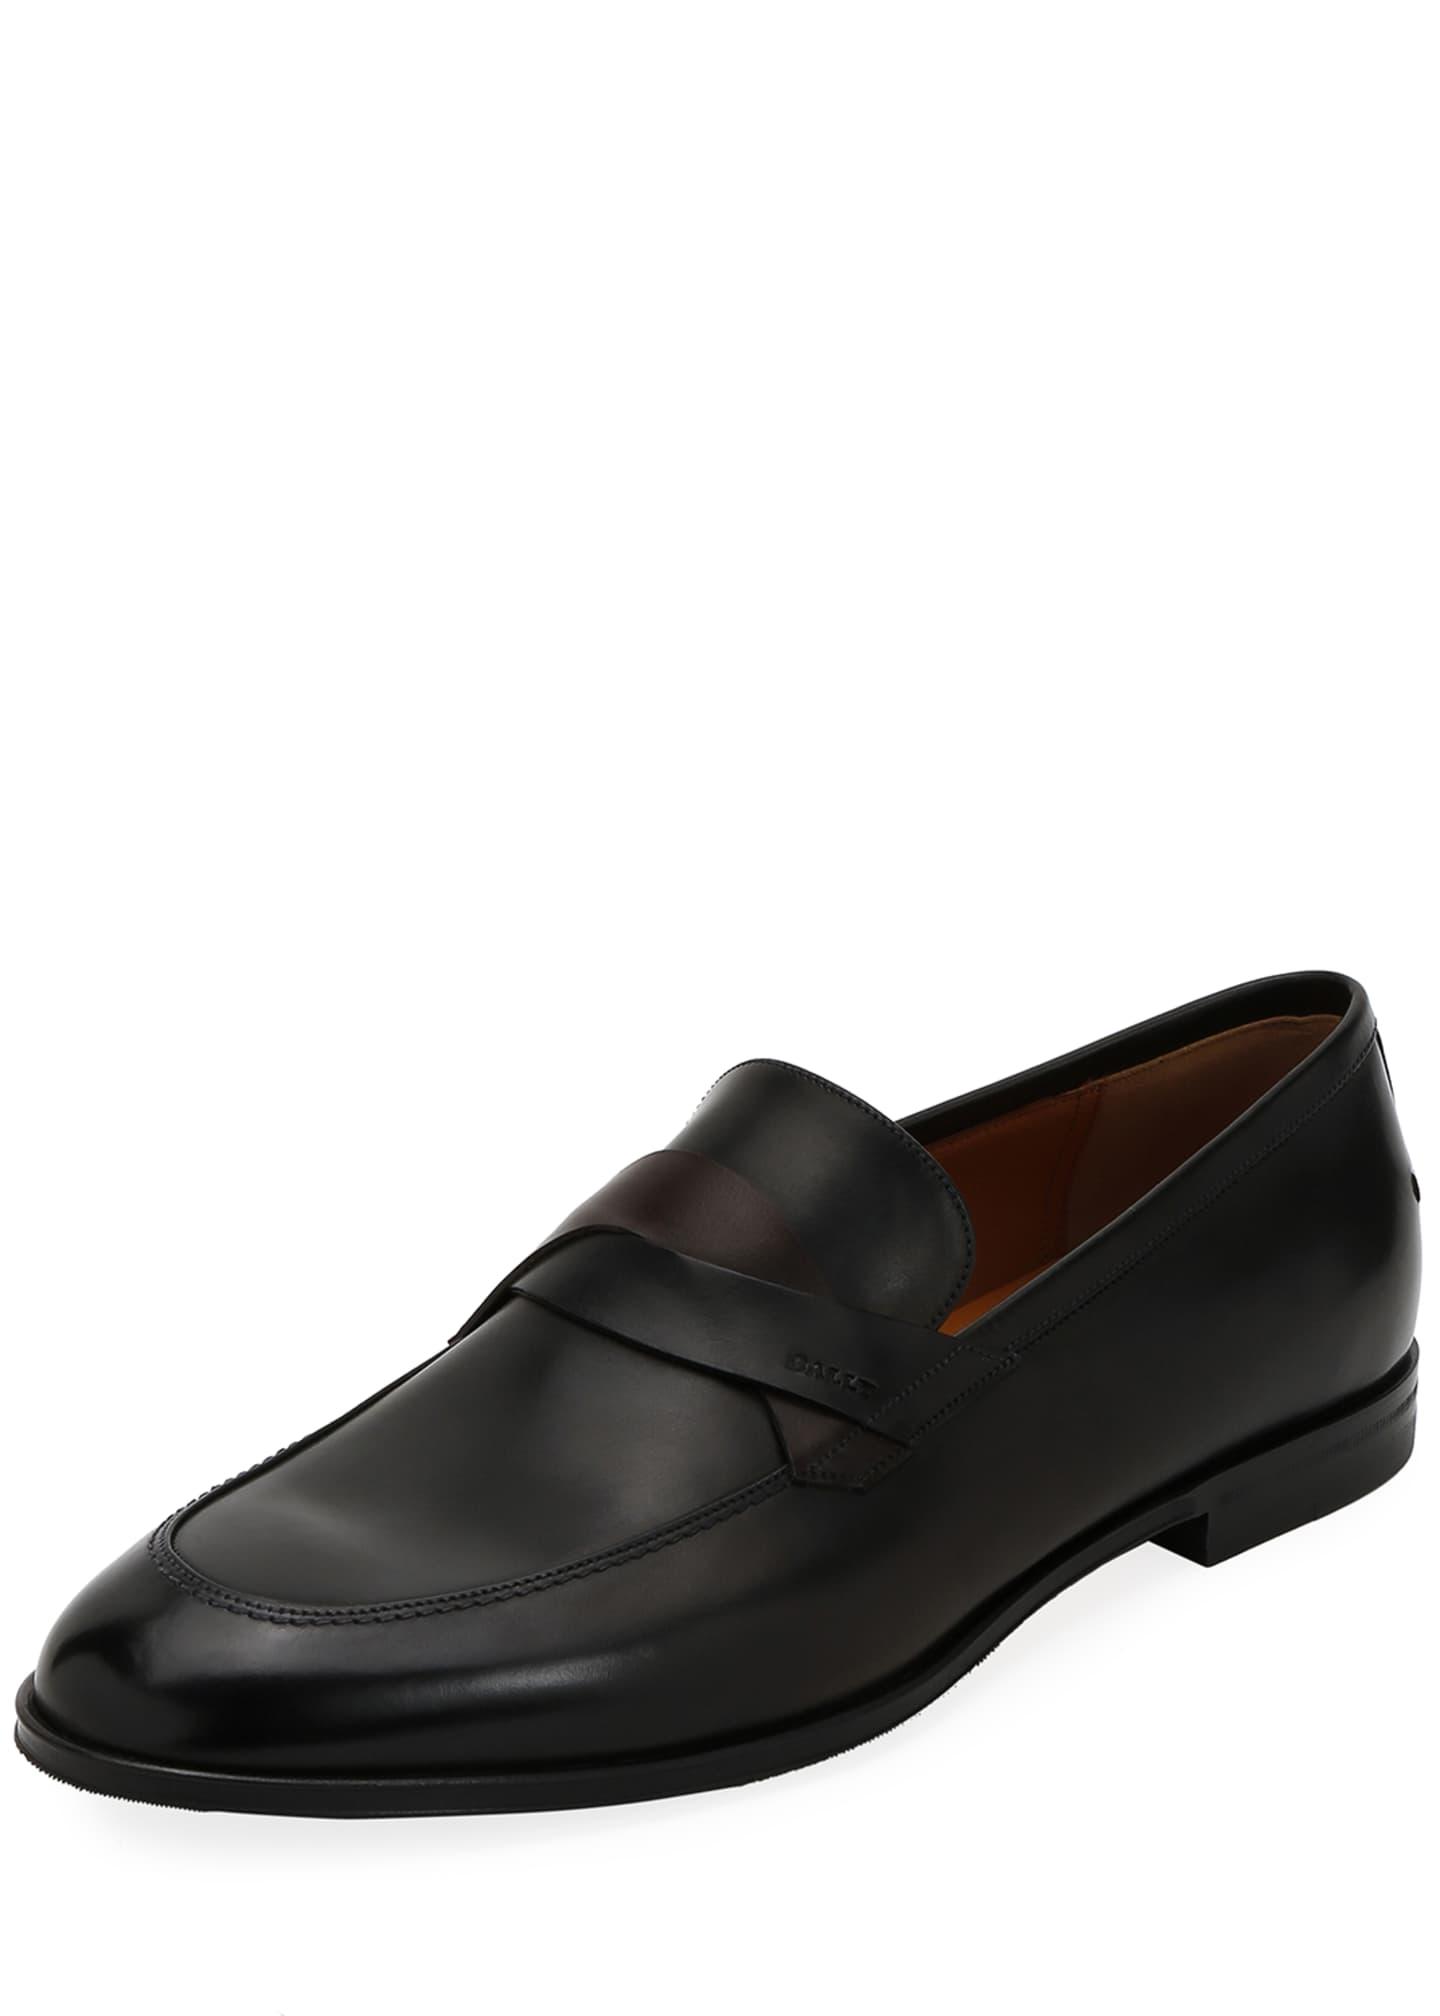 Bally Men's Welney Crisscross-Strap Leather Loafers